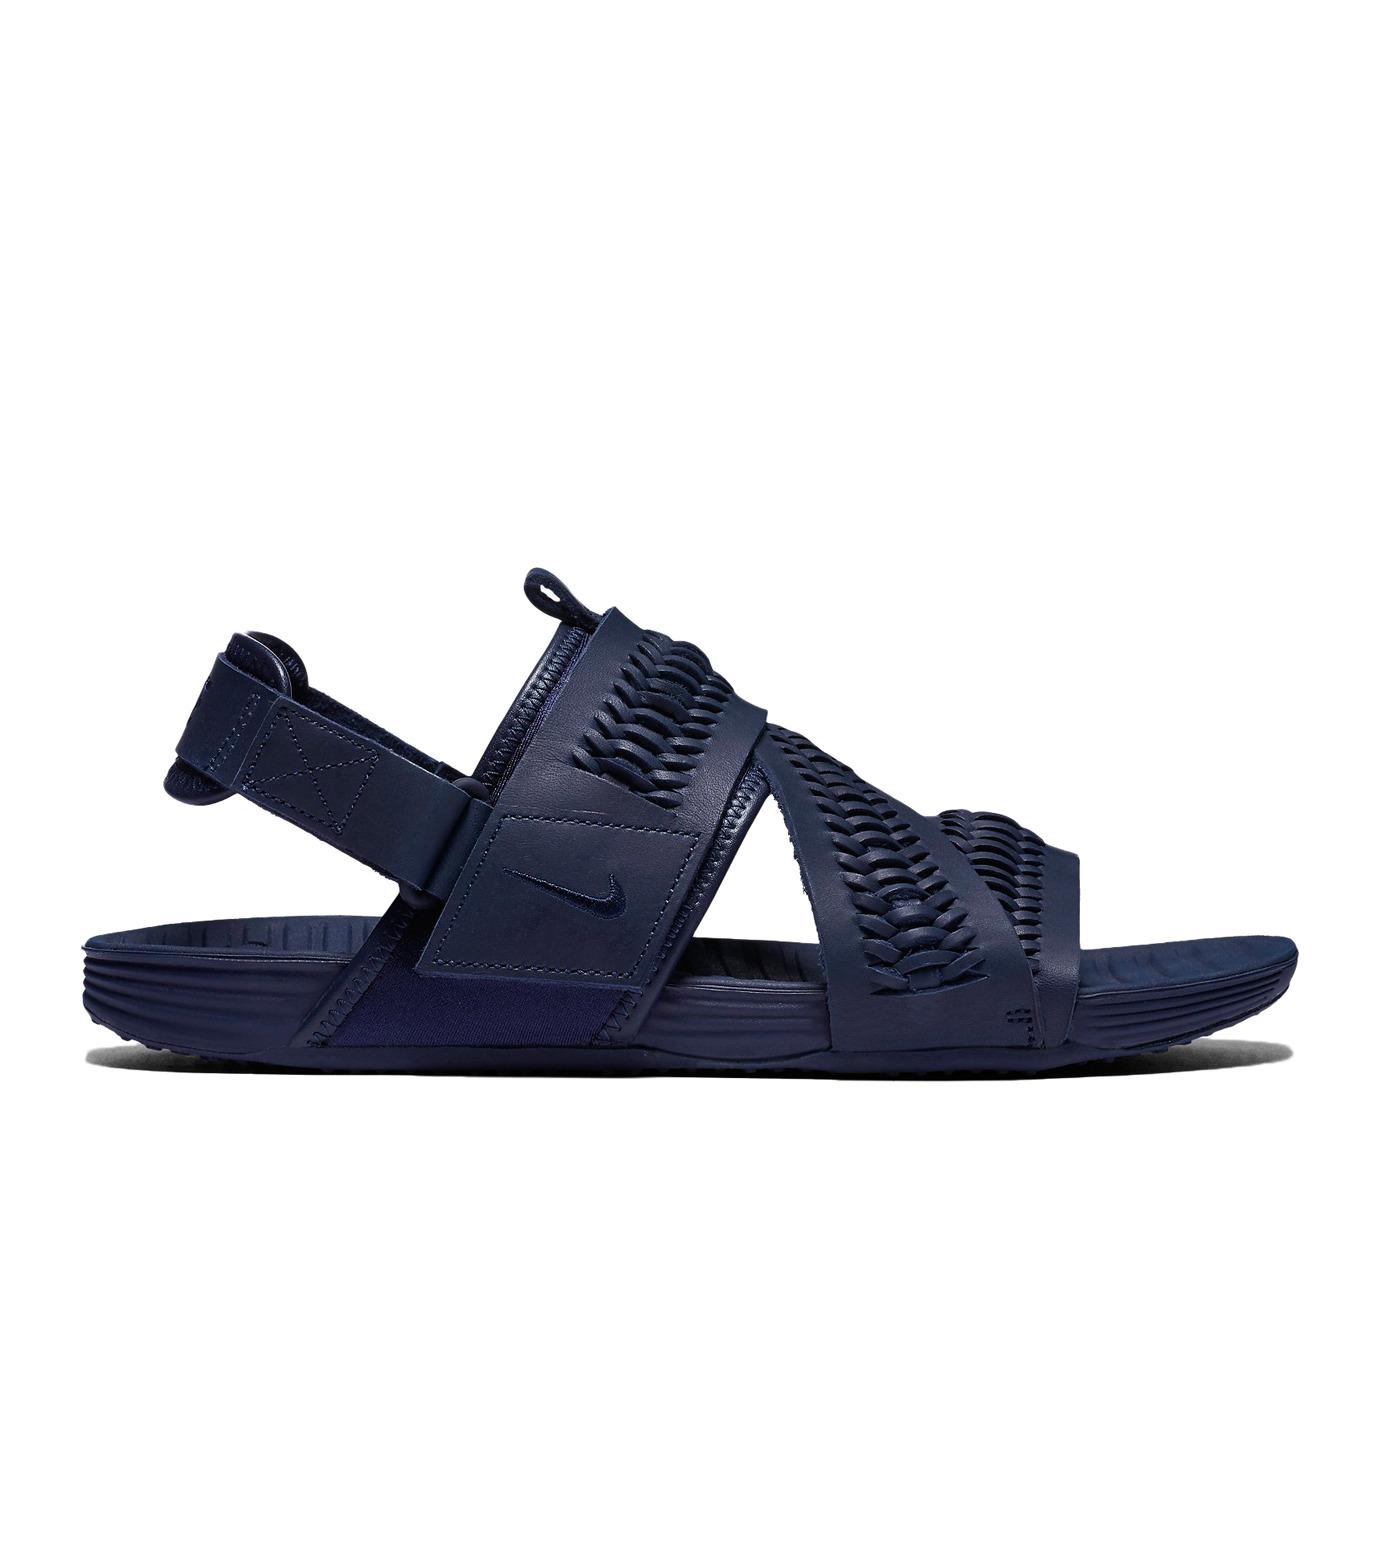 NIKE(ナイキ)のAIR SOLARSOFT ZIGZAG-BLUE(シューズ/shoes)-850588-400-92 拡大詳細画像1